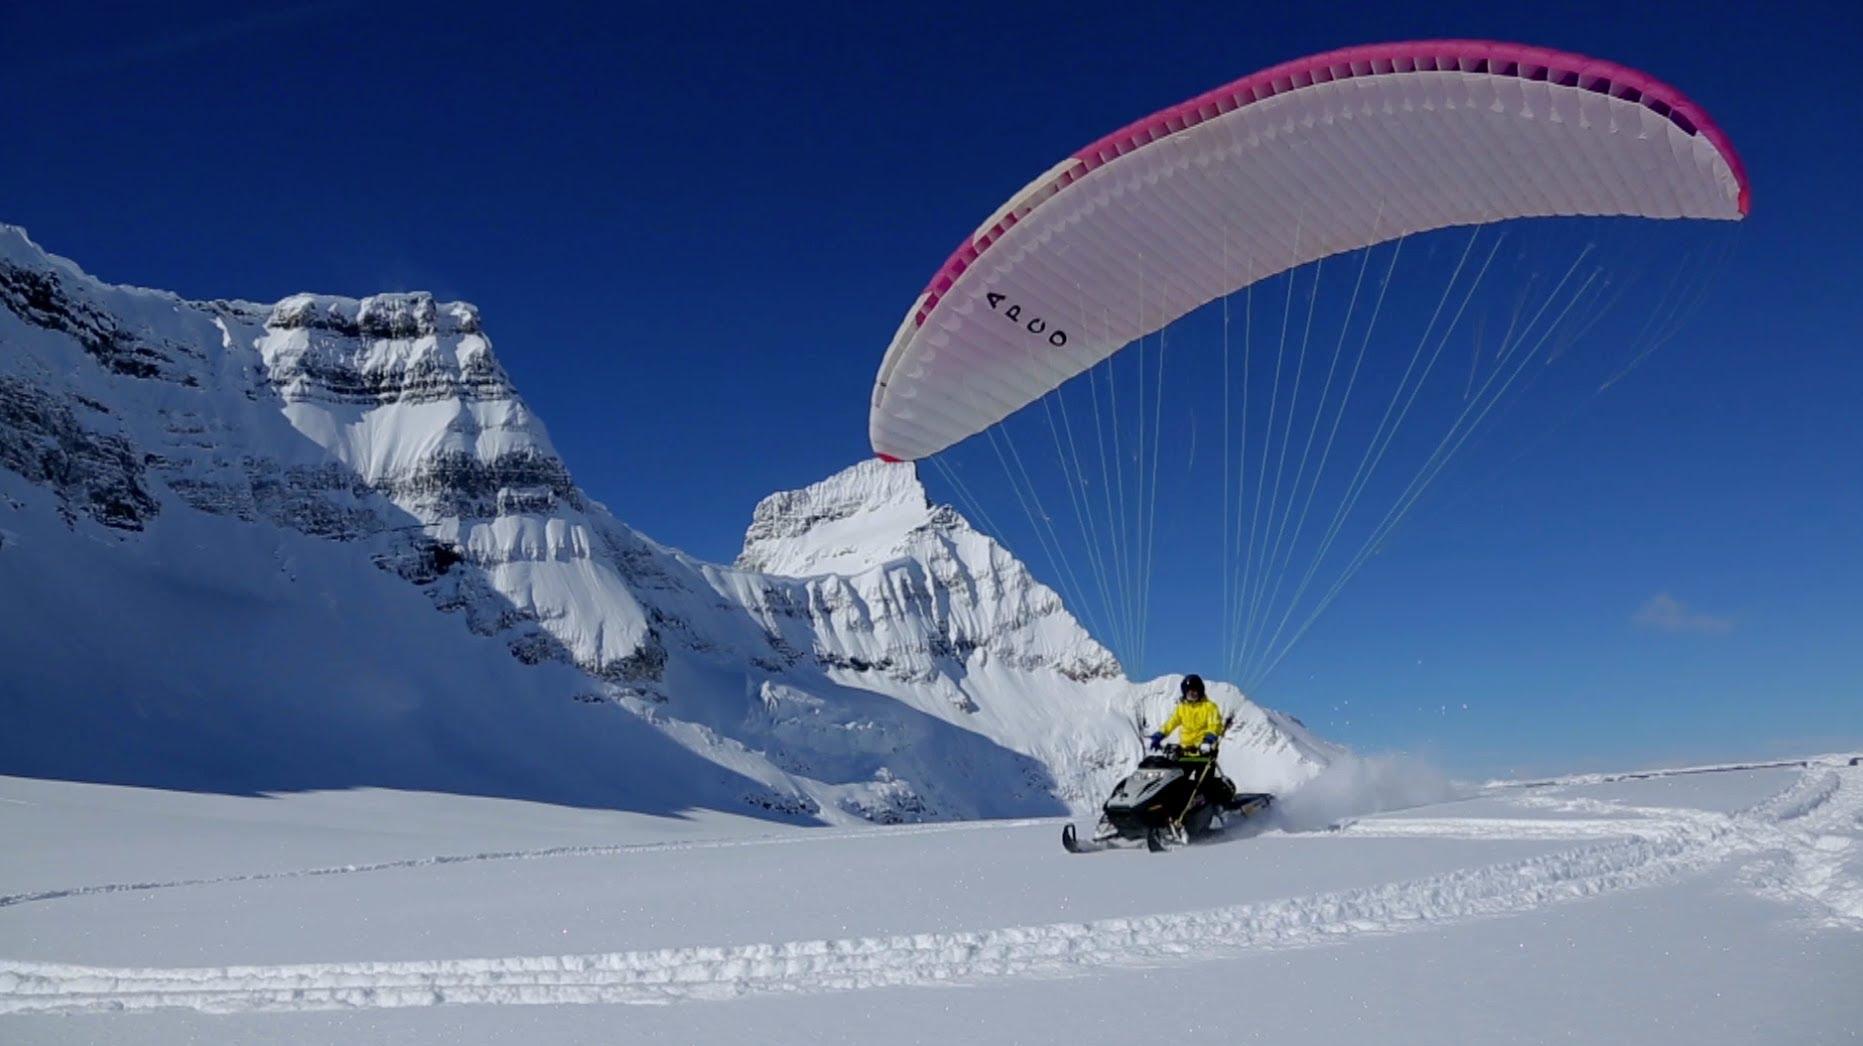 VIDEO: Lidojums ar sniega motociklu. (The Flying Snowmobile)